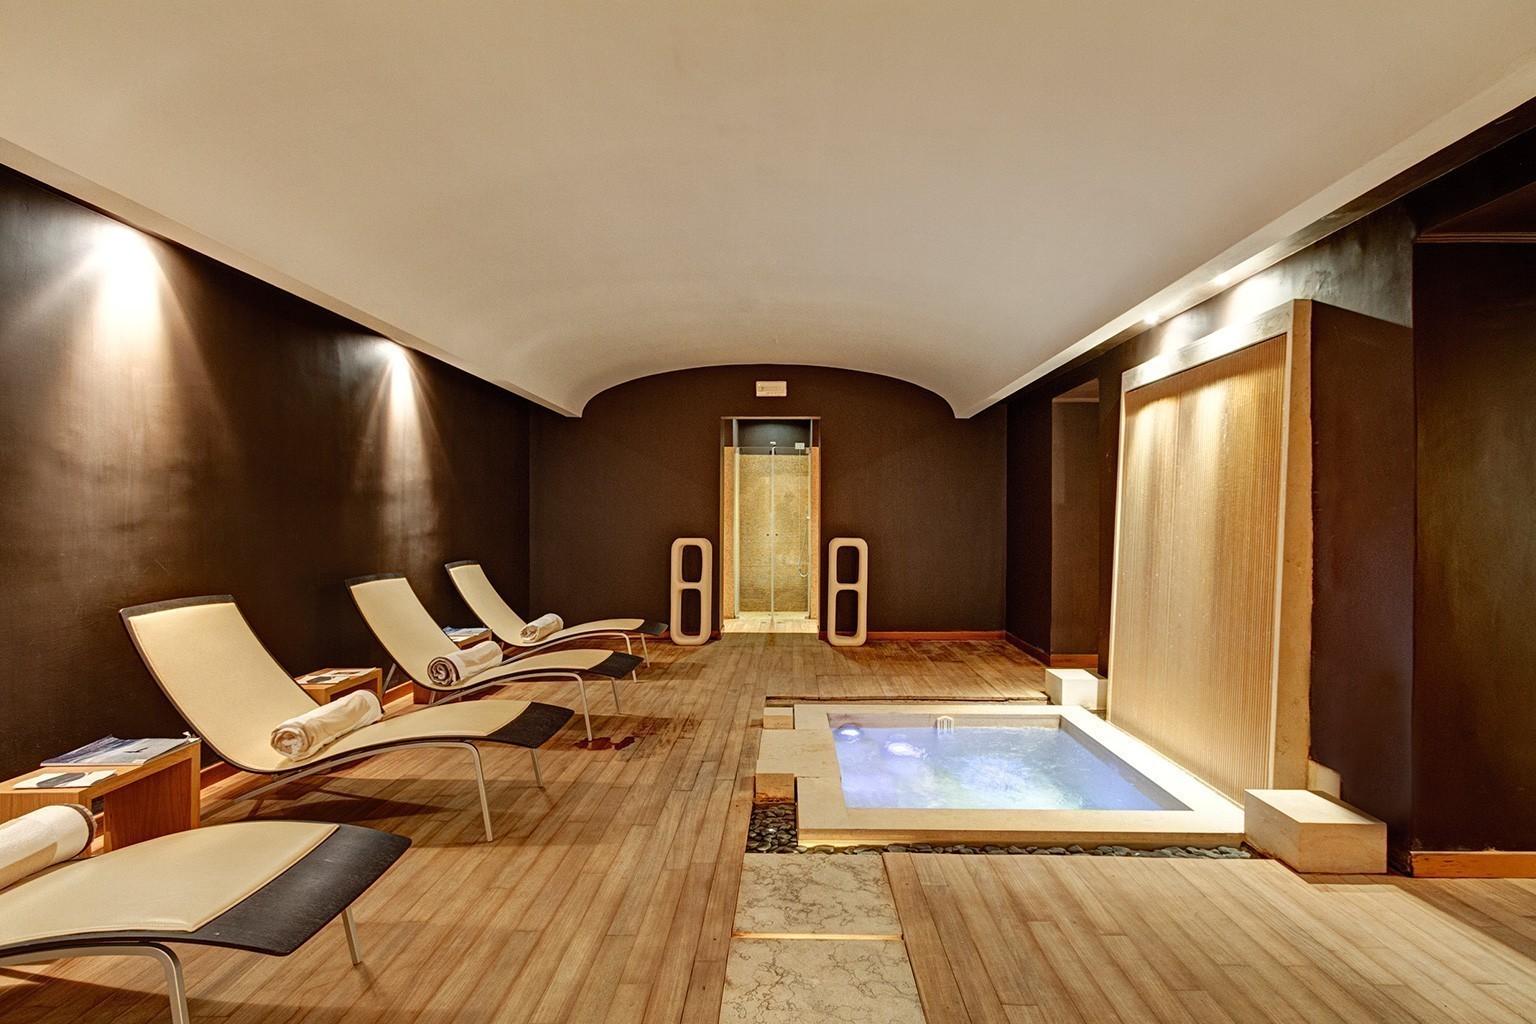 stunning capri suite moderne einrichtung ideas house. Black Bedroom Furniture Sets. Home Design Ideas